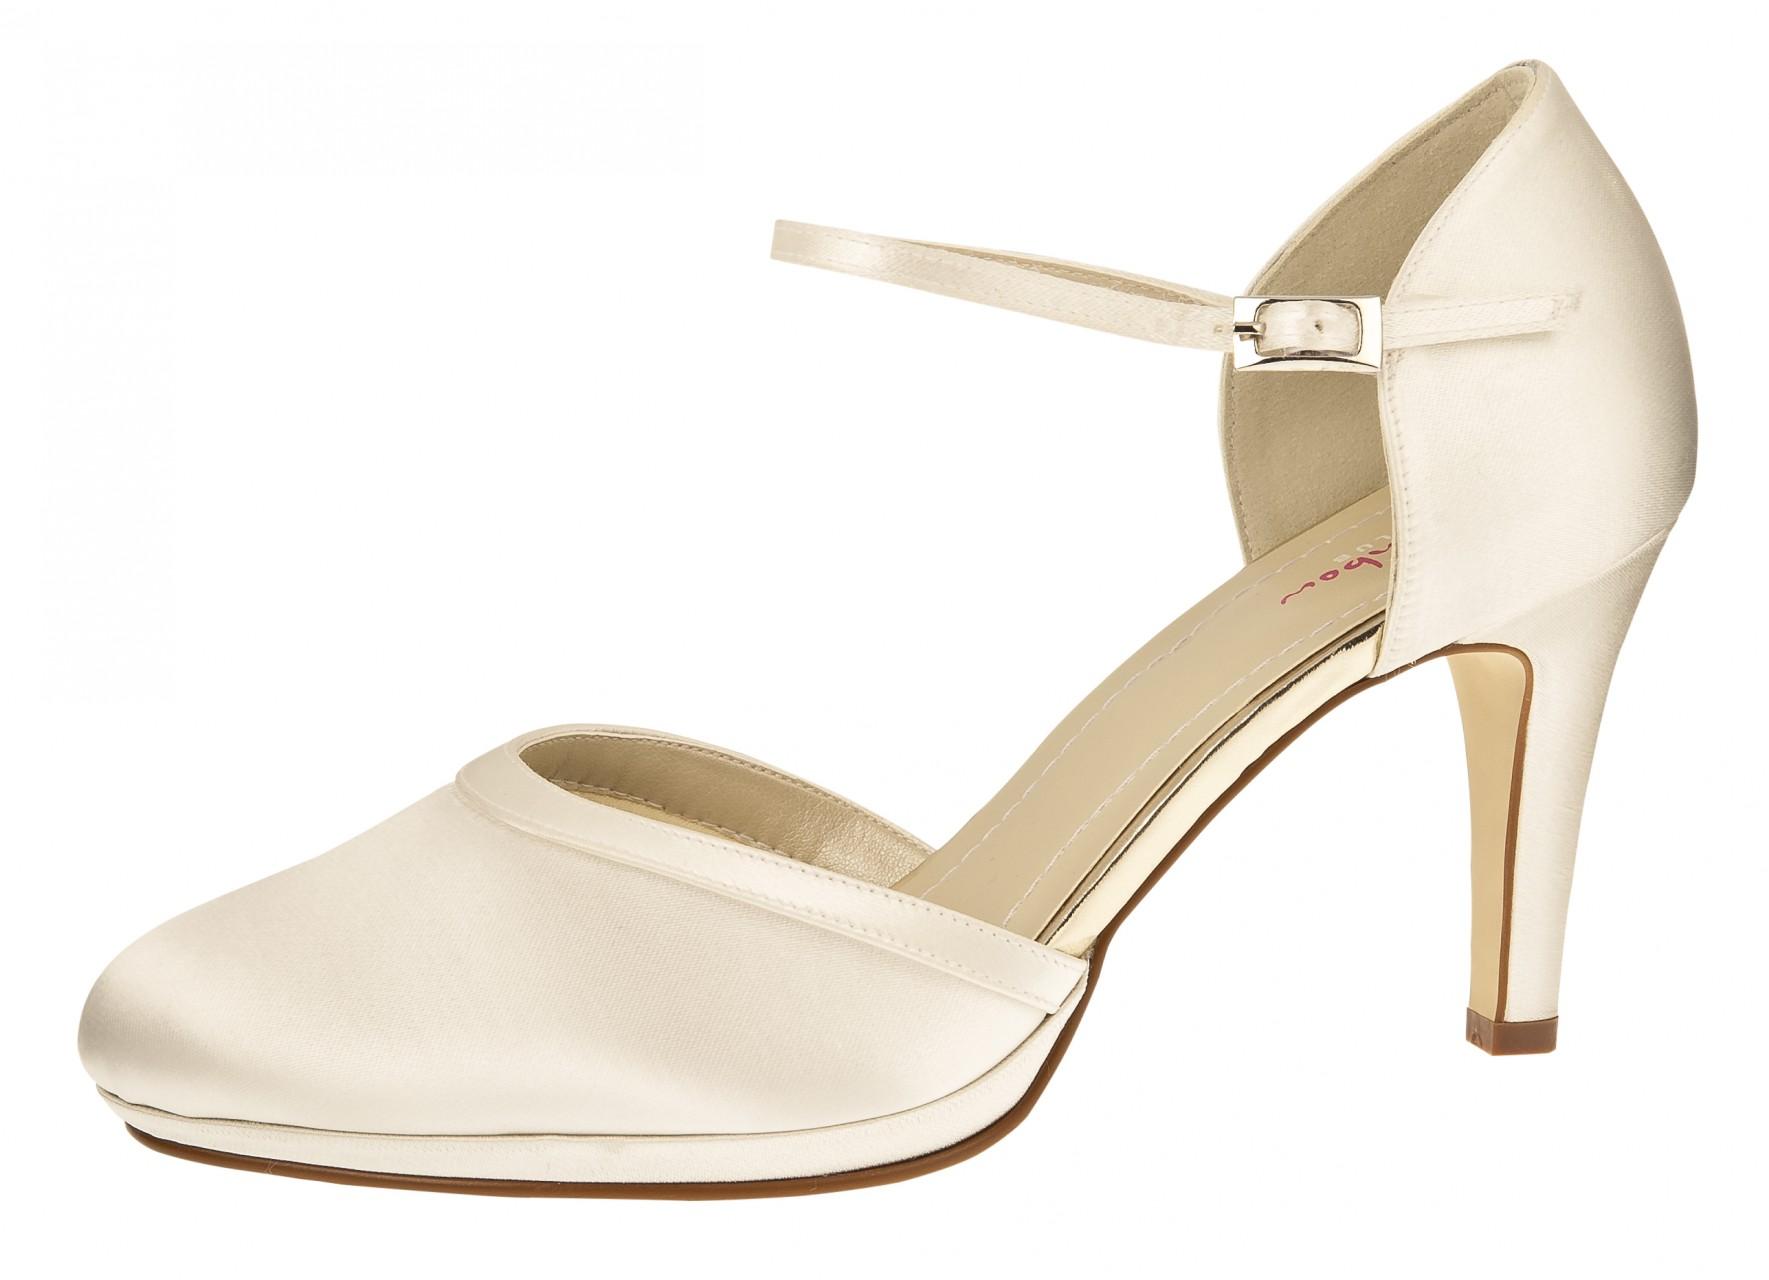 Elsa Coloured Shoes: Joni